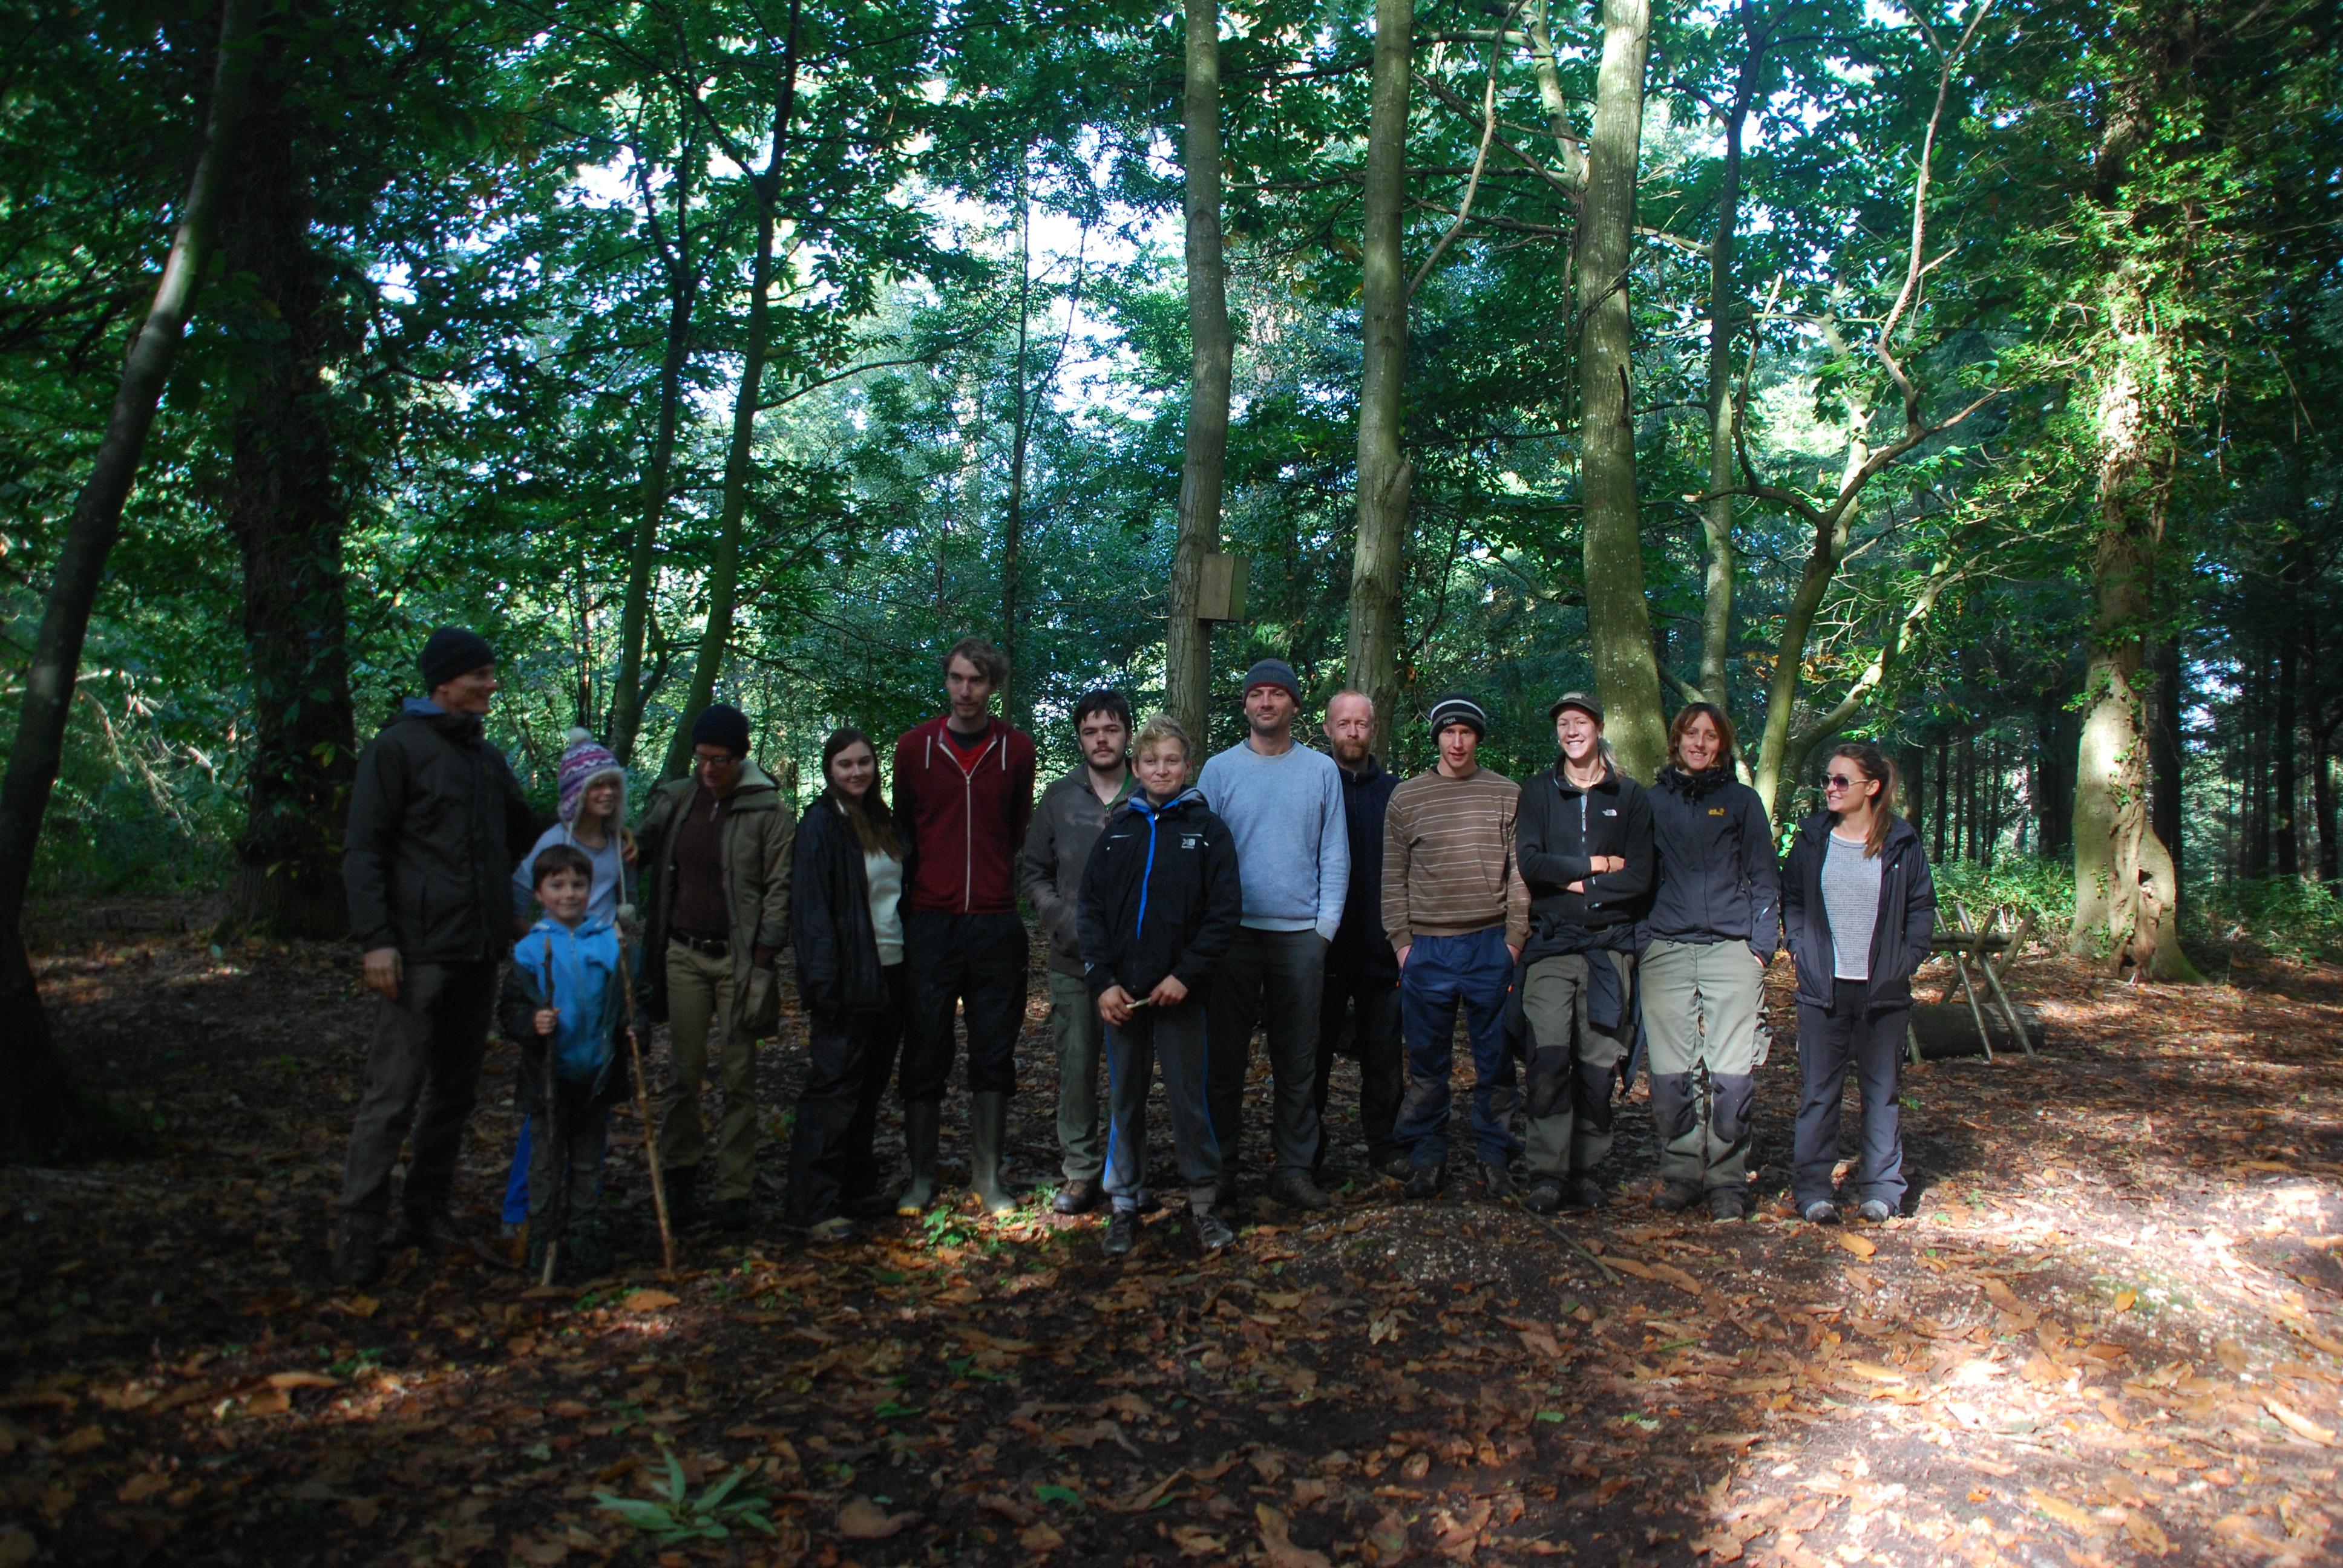 Weekend Bushcraft and Survival Course 4-6 October in Devon